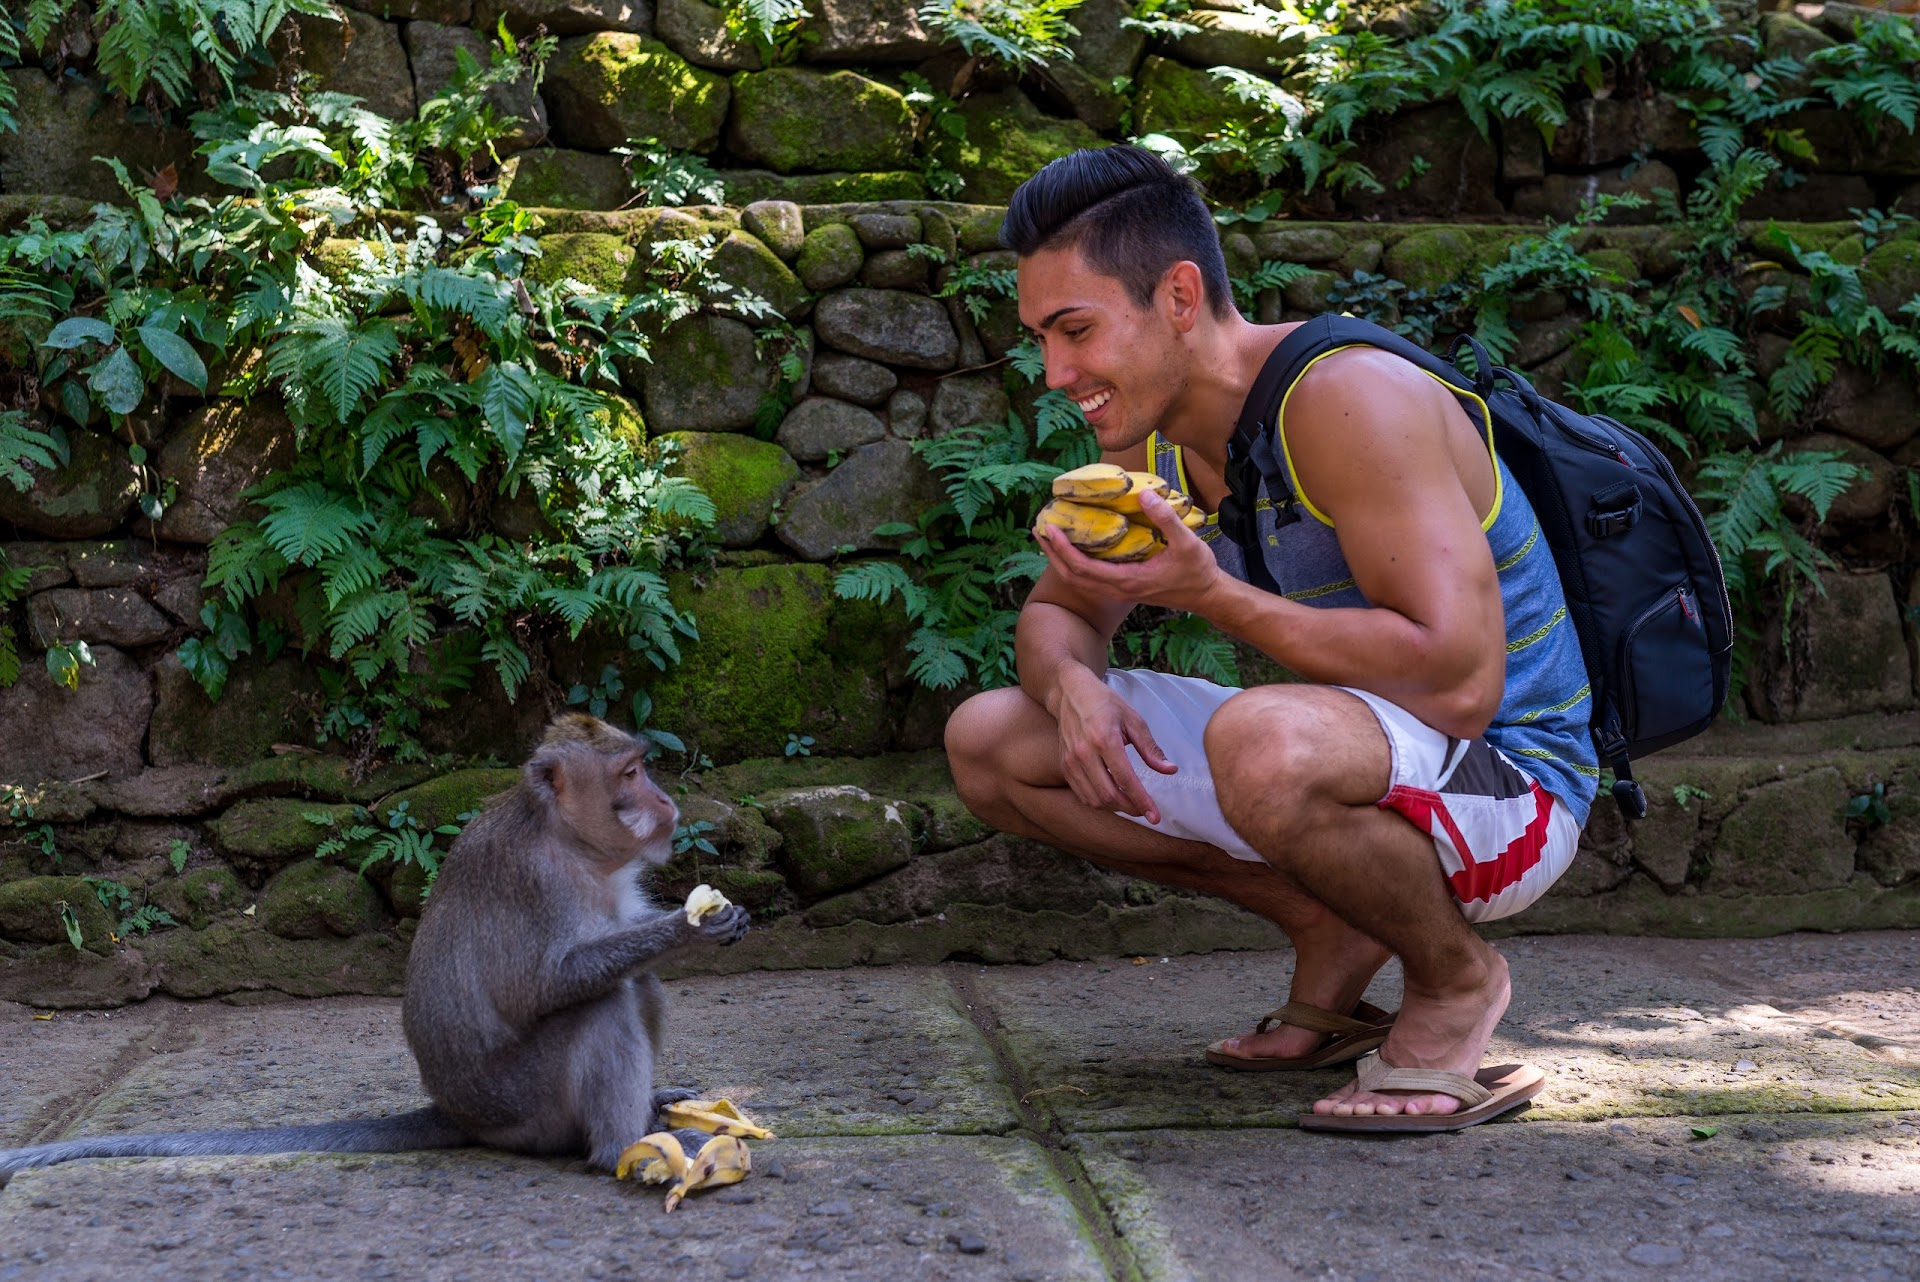 jungle, travel blog, bali ubud, monkey sanctuary, nature landscape photography, photographer california san francisco bay area, travel blogger, southeast asia, couple bloggers, animals, feedings, california travel blogger, lds mormon, asian, korean, japanese